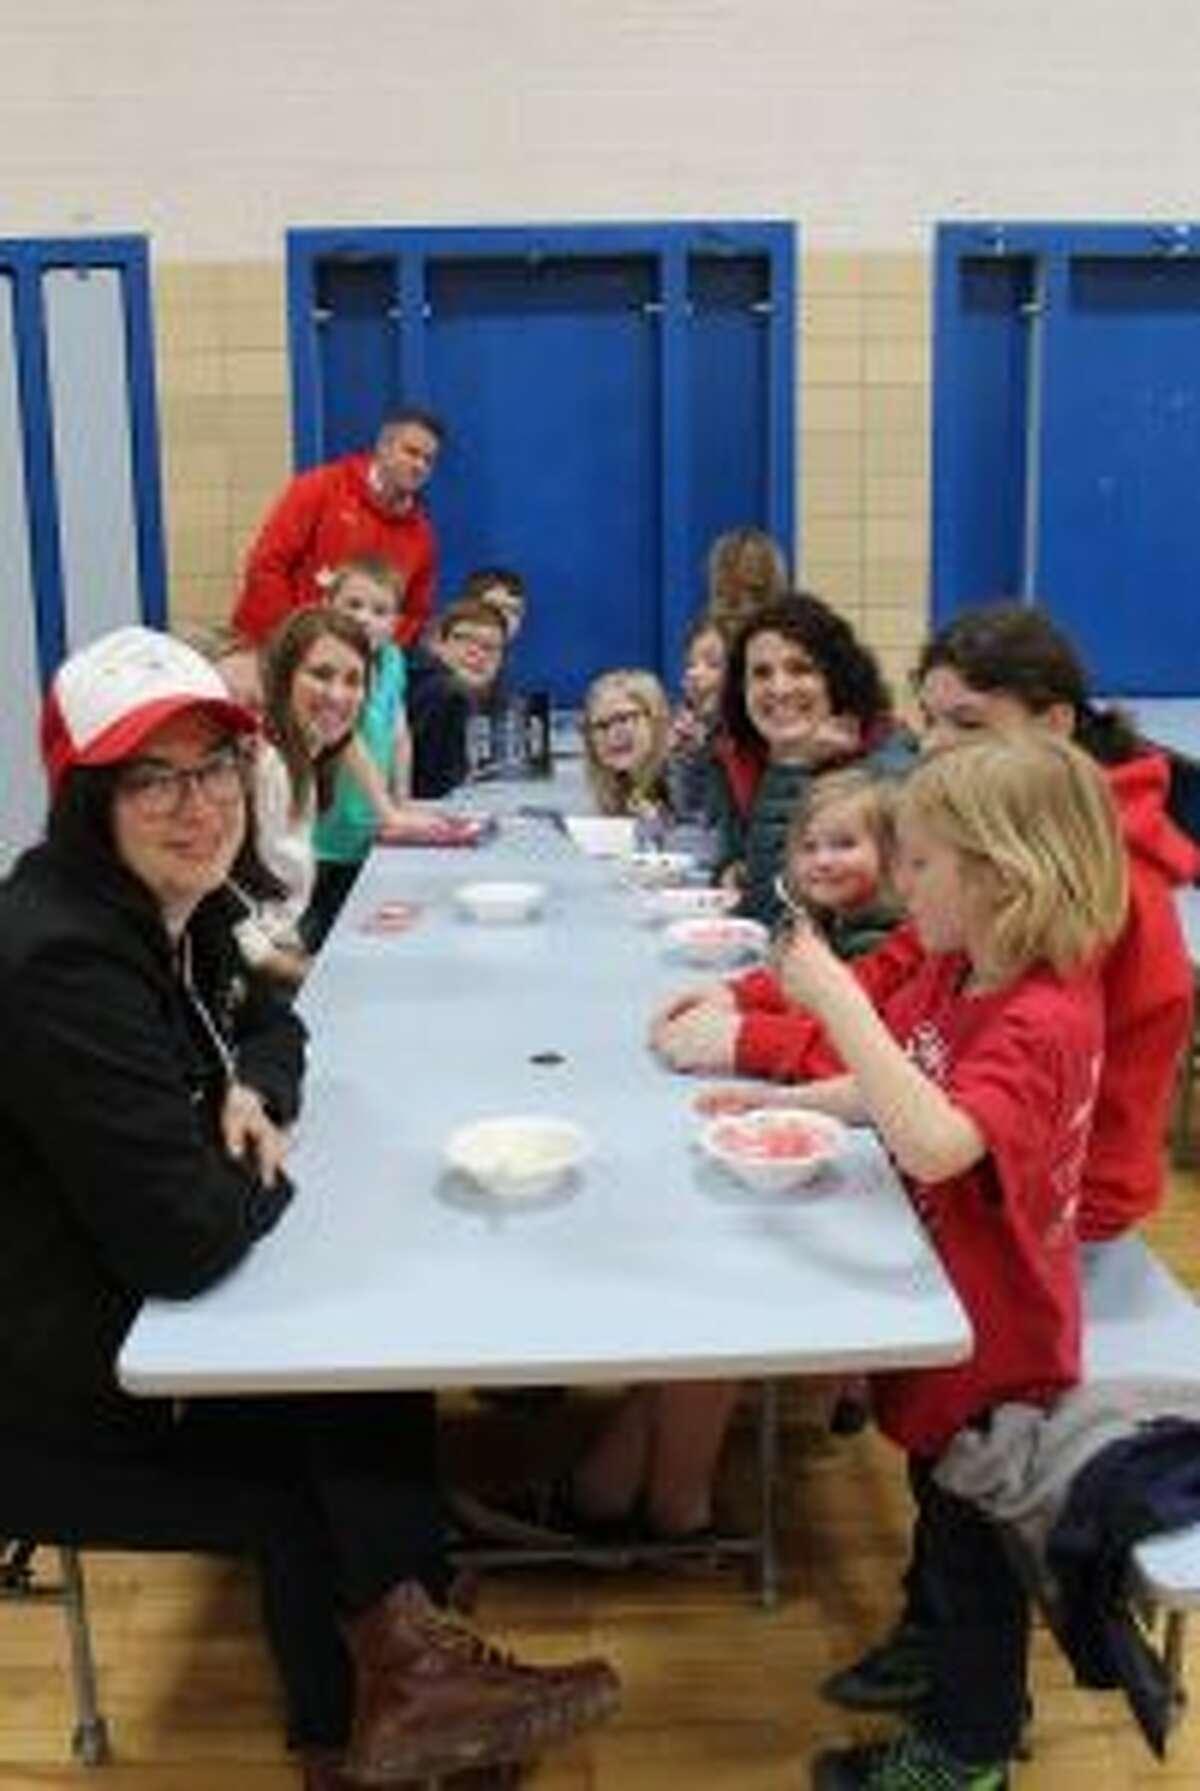 Families enjoy ice cream treats at the Crystal Lake Elementary Art Fair. (Courtesy photo)